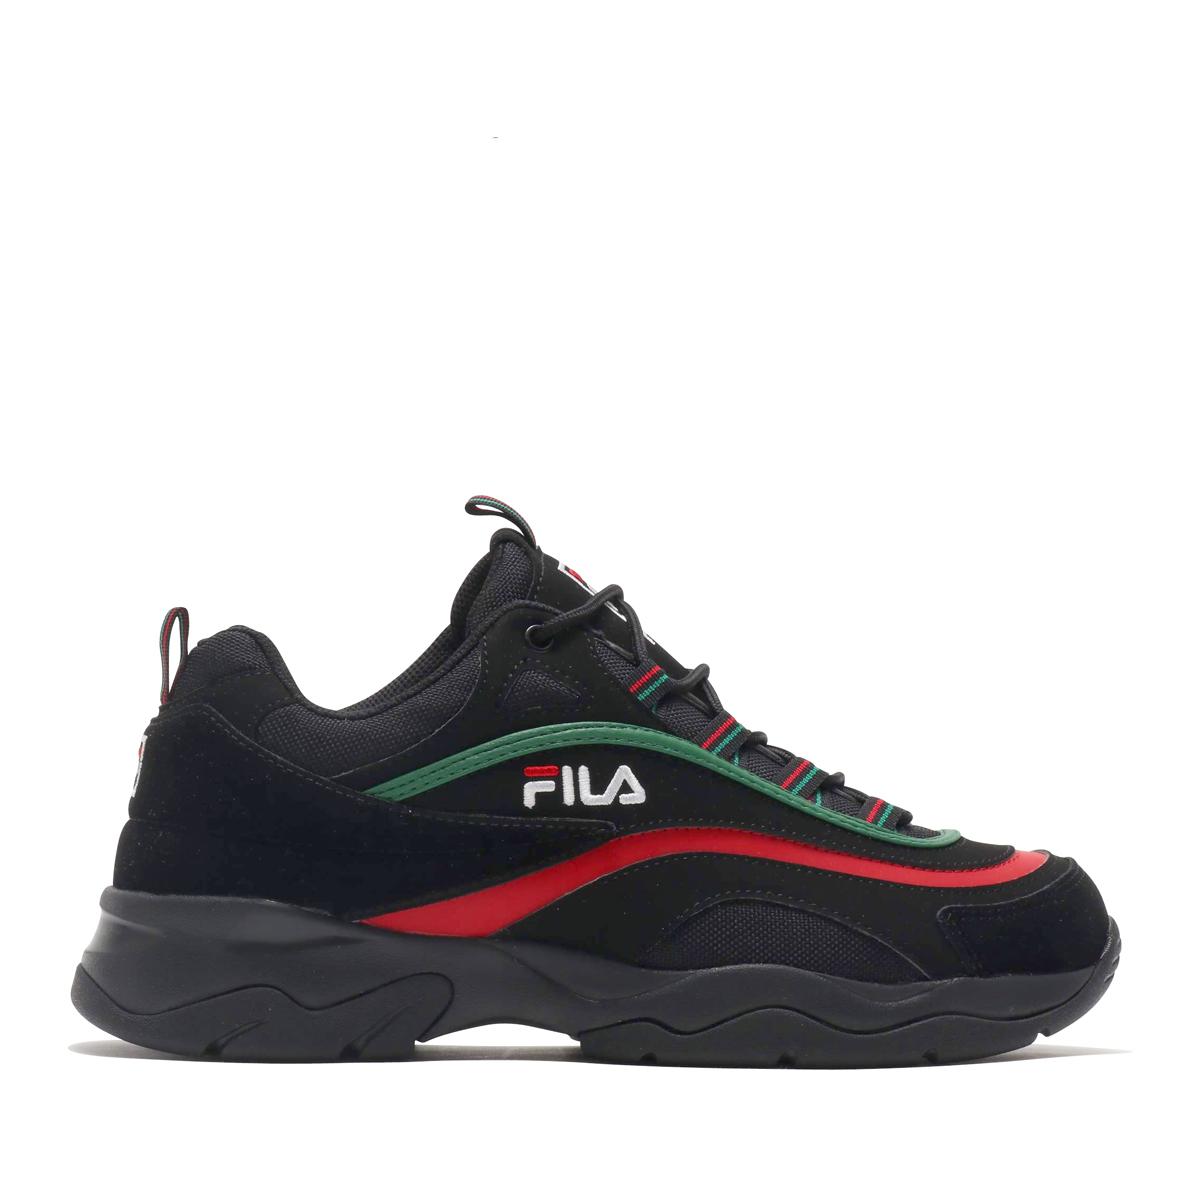 fila ray black \u003e Factory Store